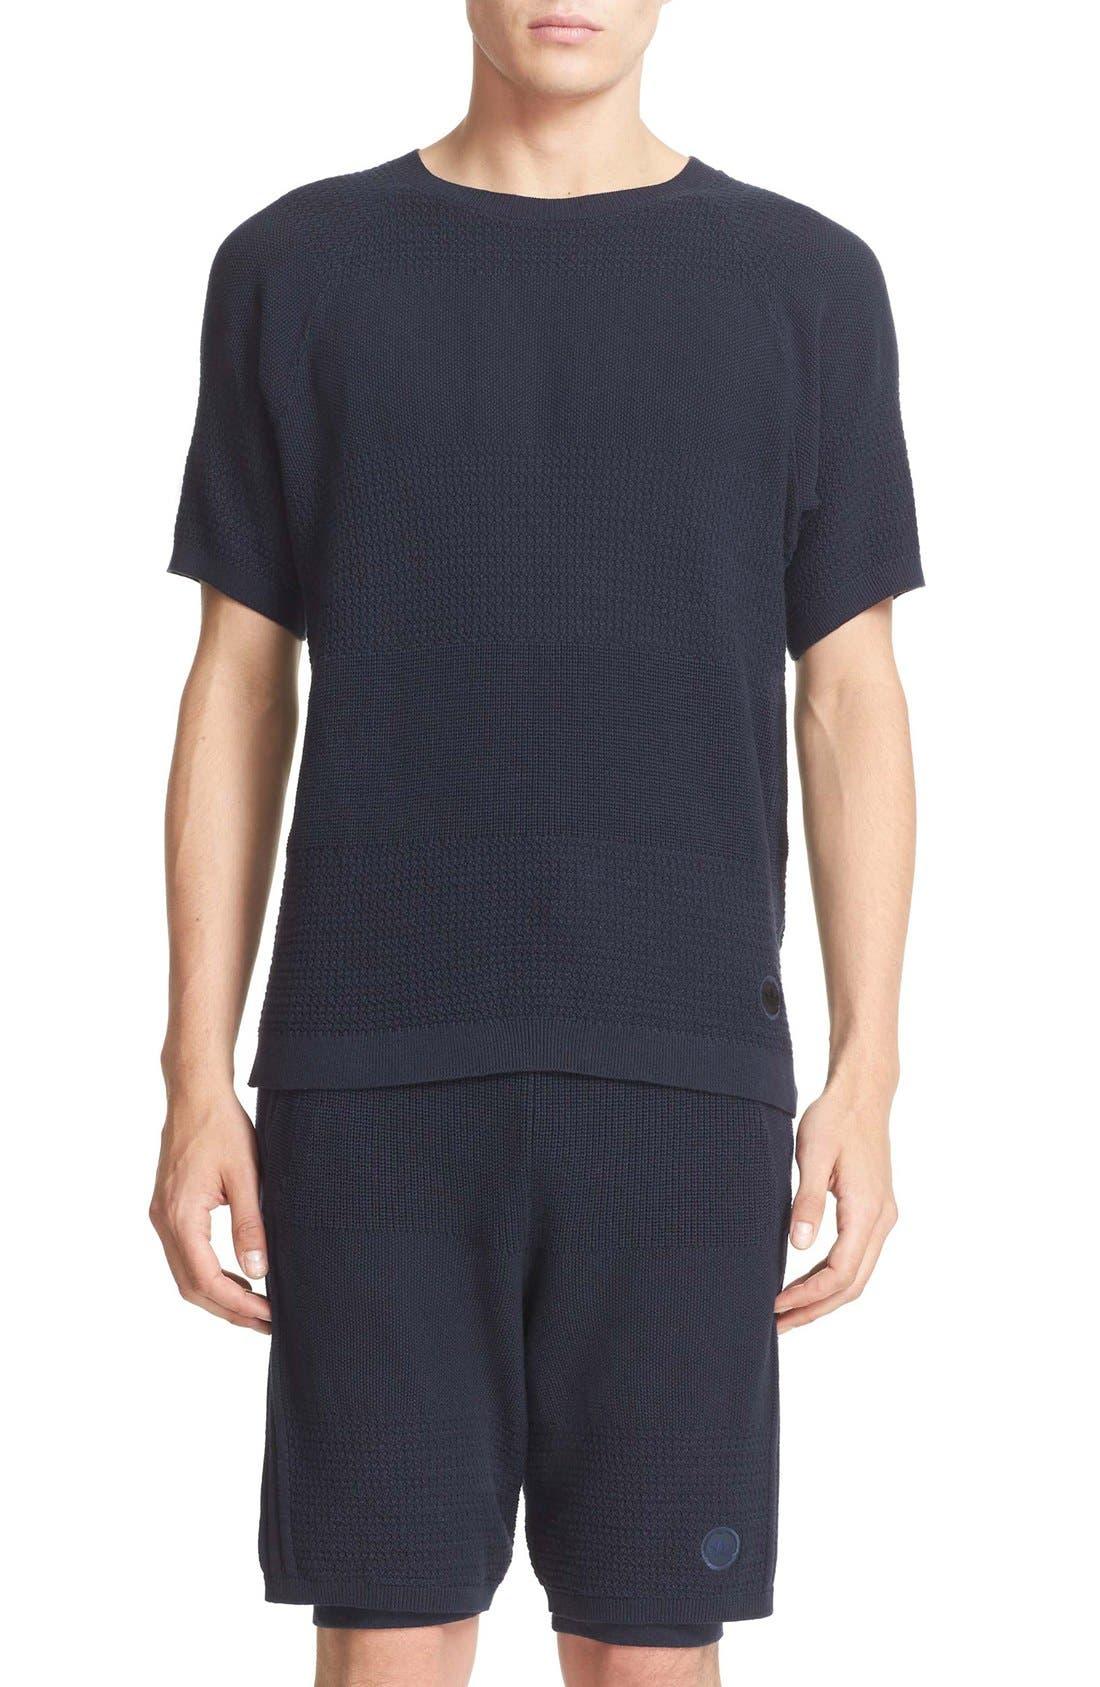 Main Image - wings + horns x adidas Linear Cotton & Linen T-Shirt